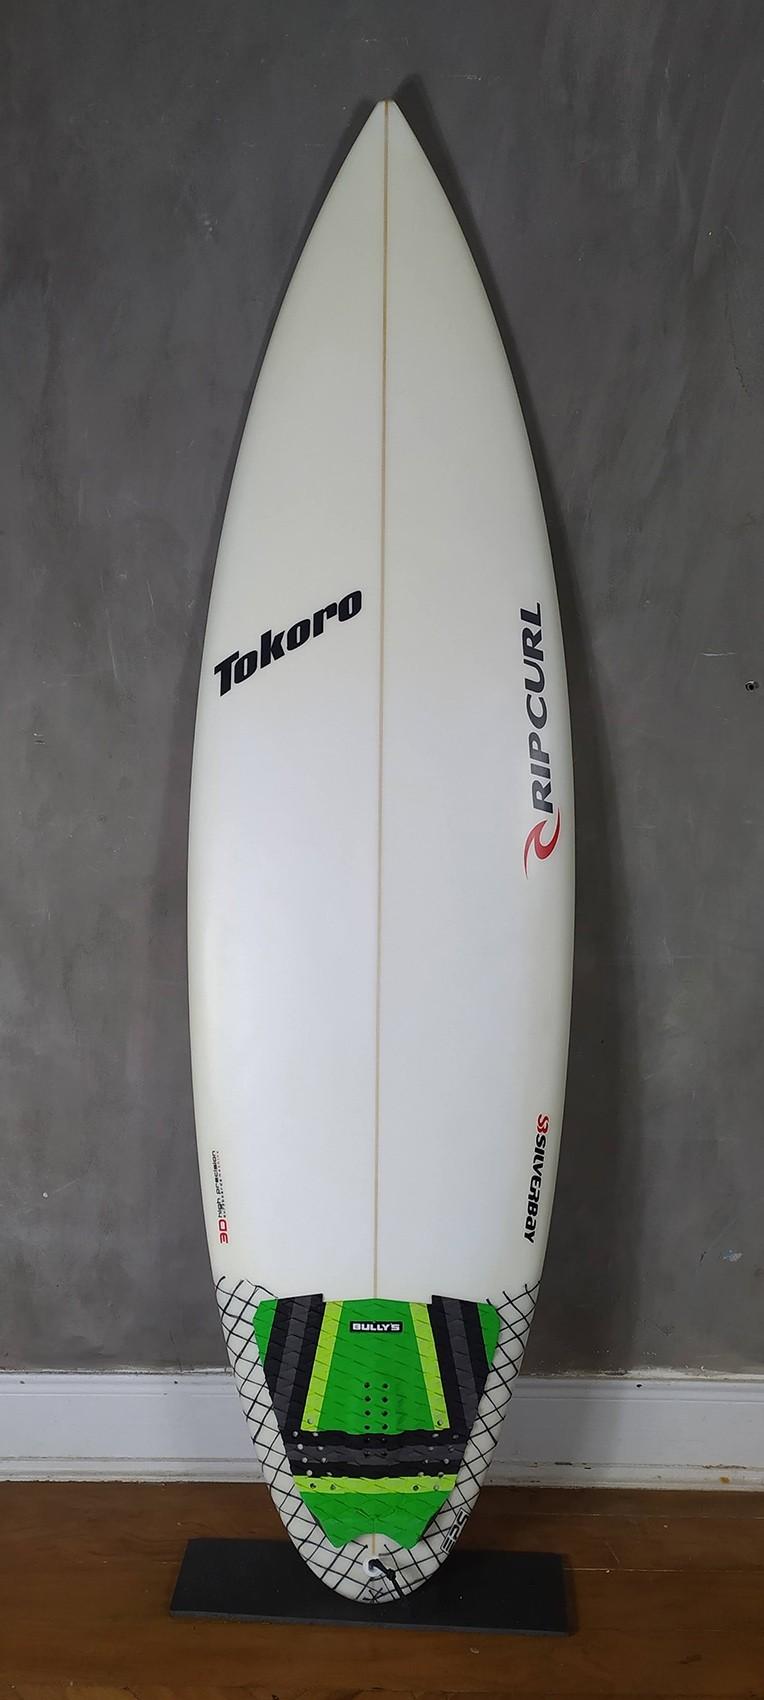 "Prancha de Surf Rip Curl Tokoro 5'11"" MXM EPS Seminova"